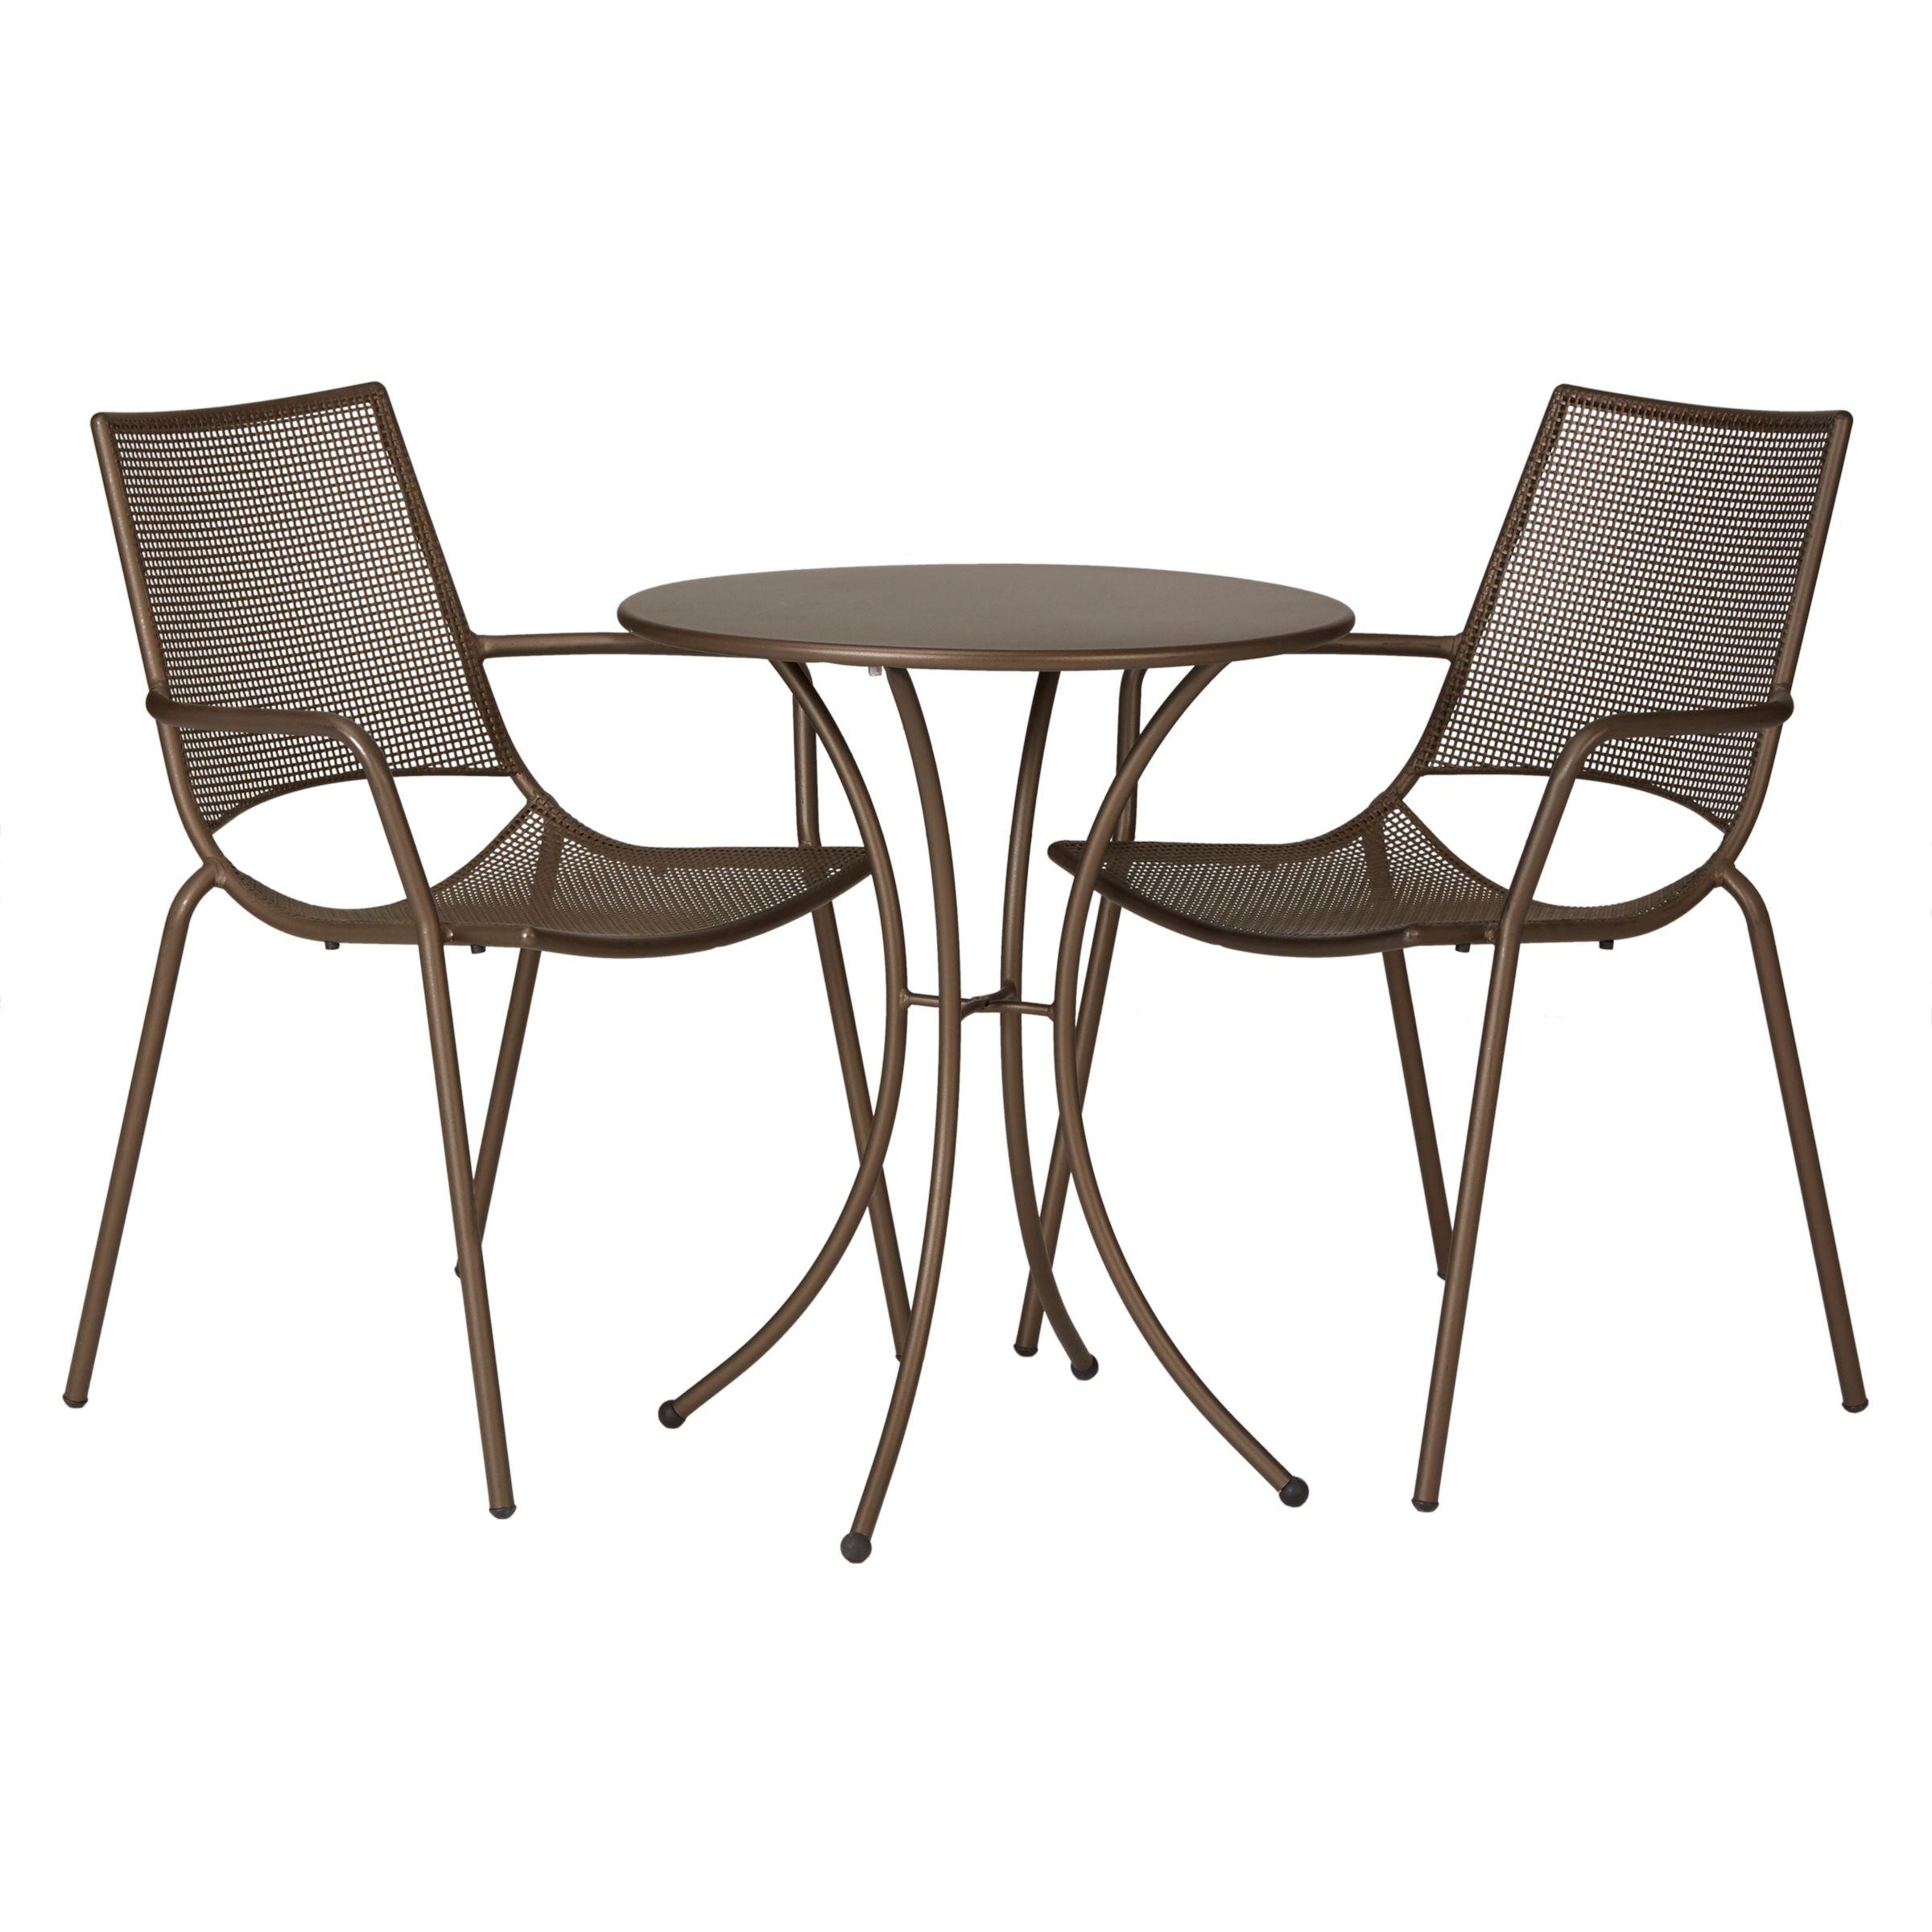 EMU Ala Mesh Garden Table and Chairs Bistro Set, Bronze